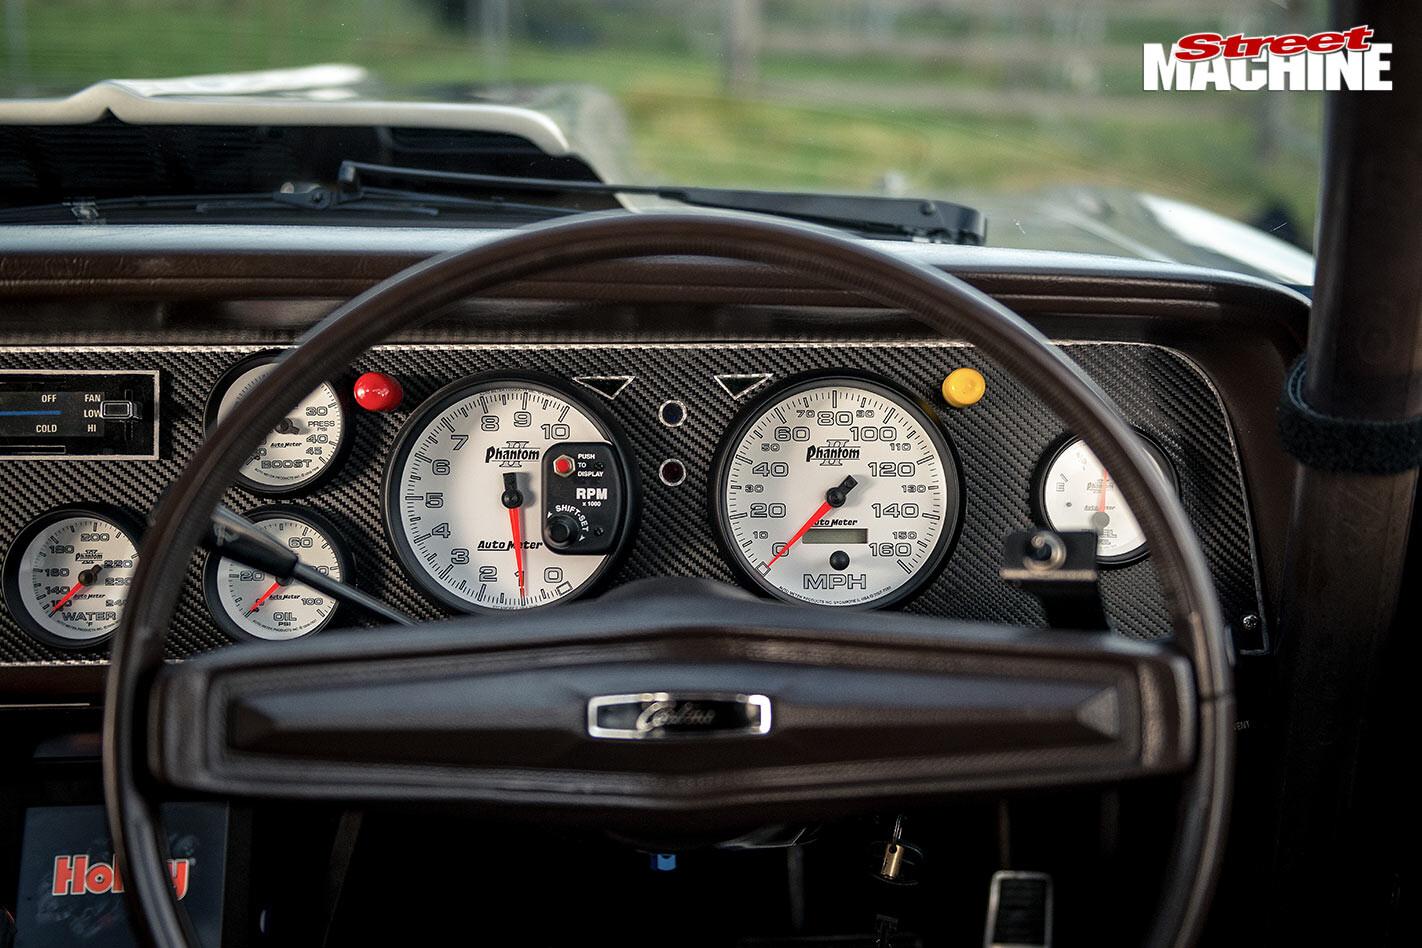 Ford TD Cortina dash